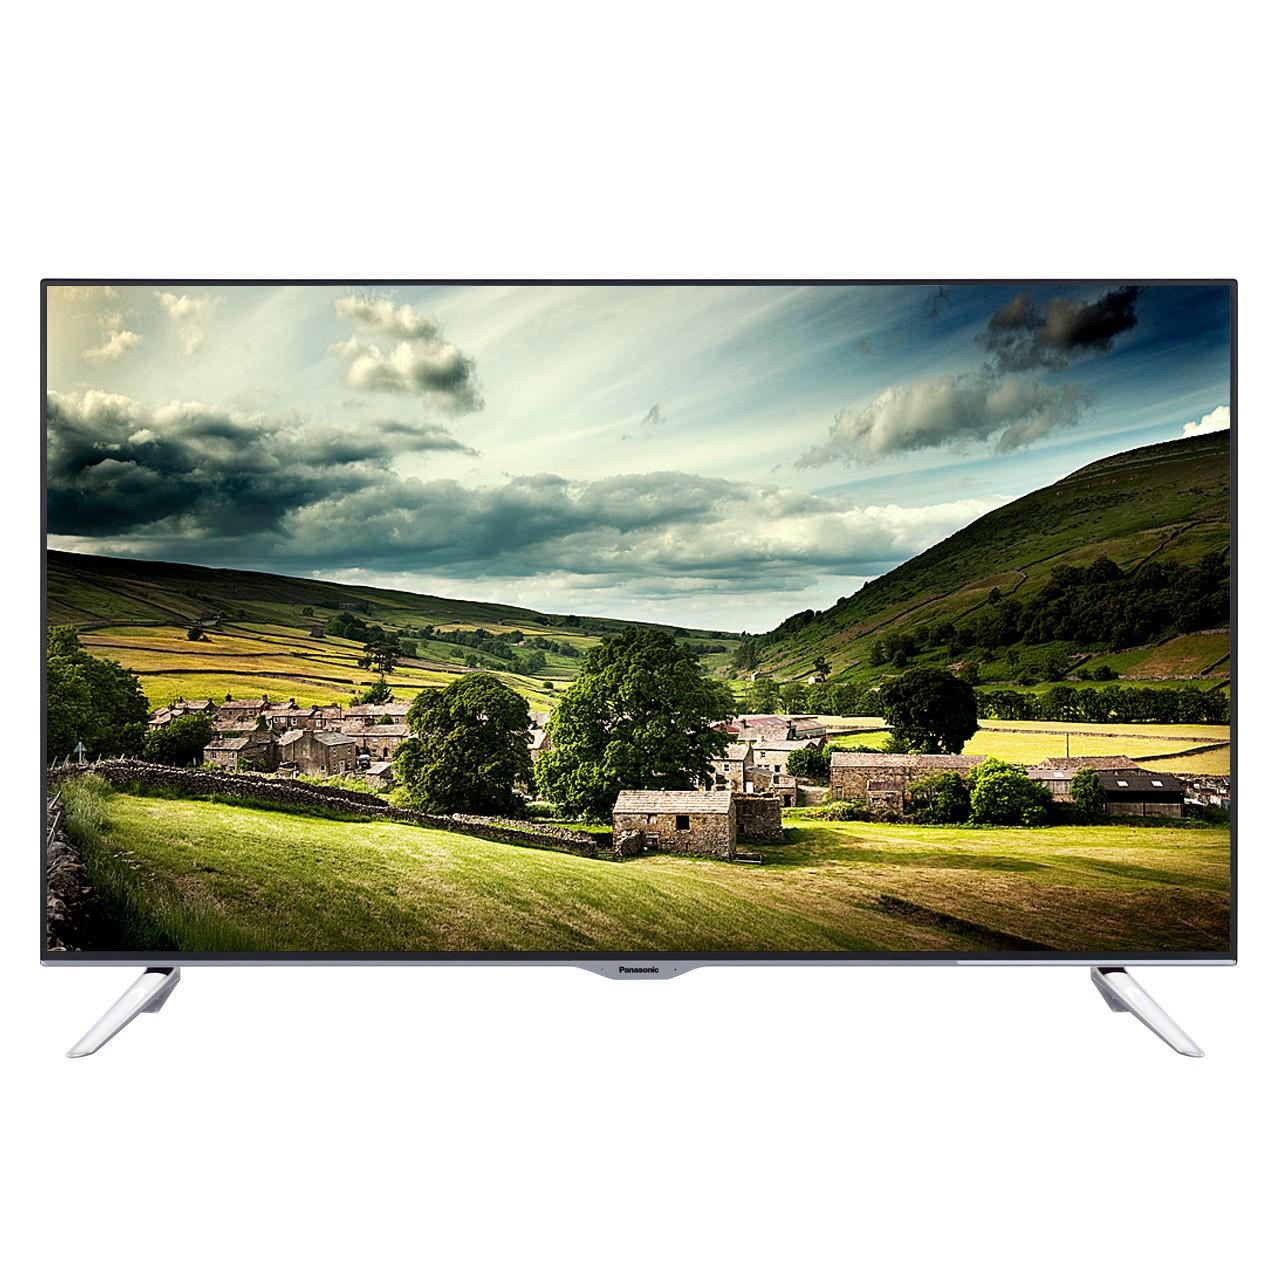 panasonic viera tx 48cx400b 48 inch 3d smart 4k ultra hd tv built in freeview hd ebay. Black Bedroom Furniture Sets. Home Design Ideas